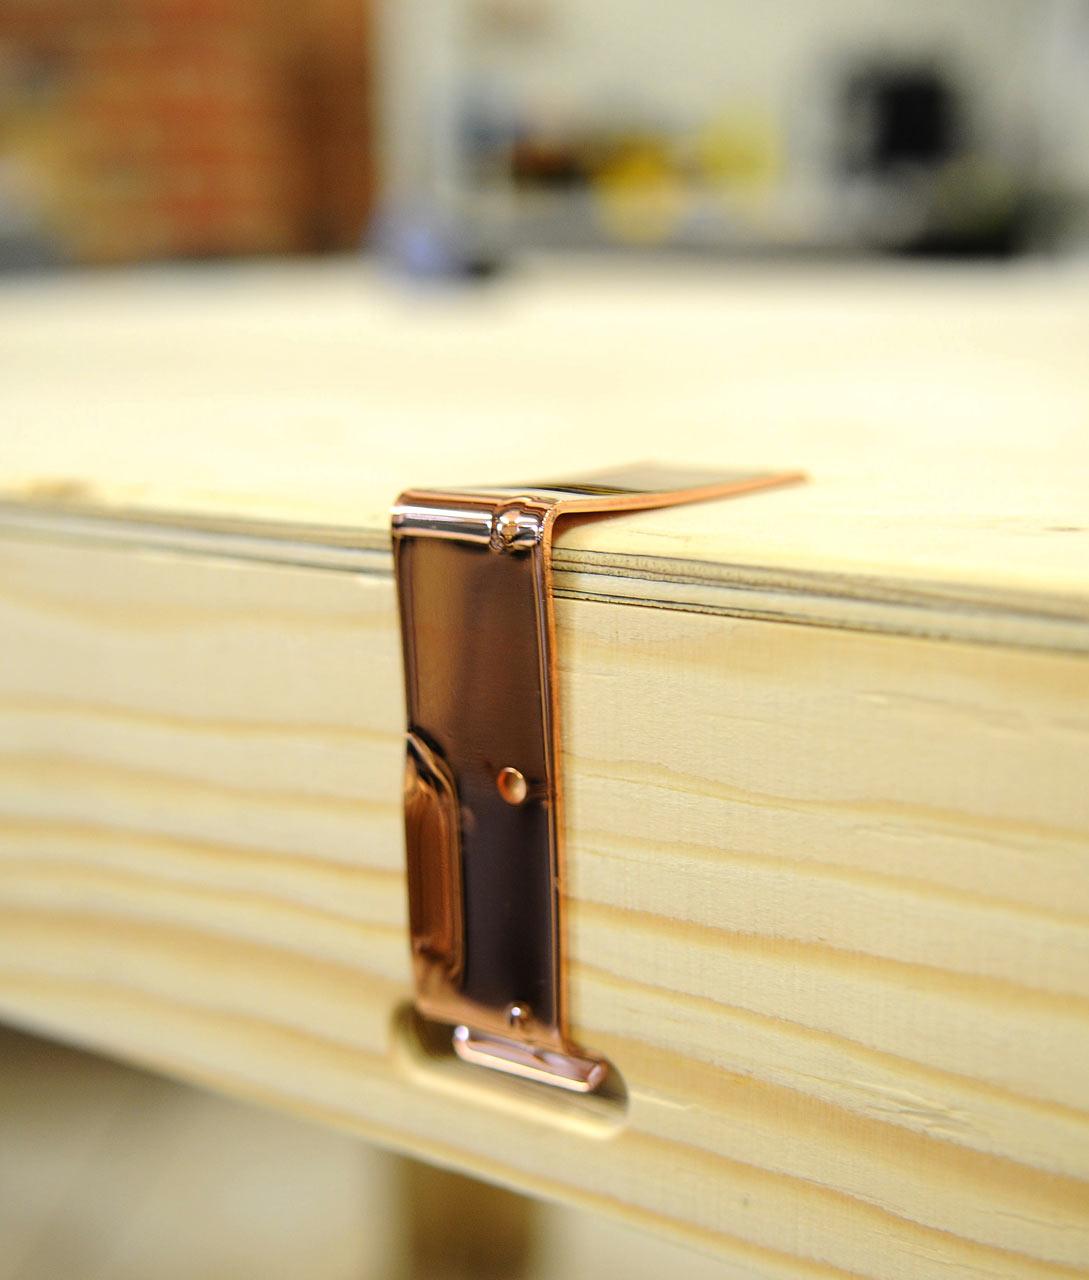 Pakiet-Modular-Furniture-hisheji (16)